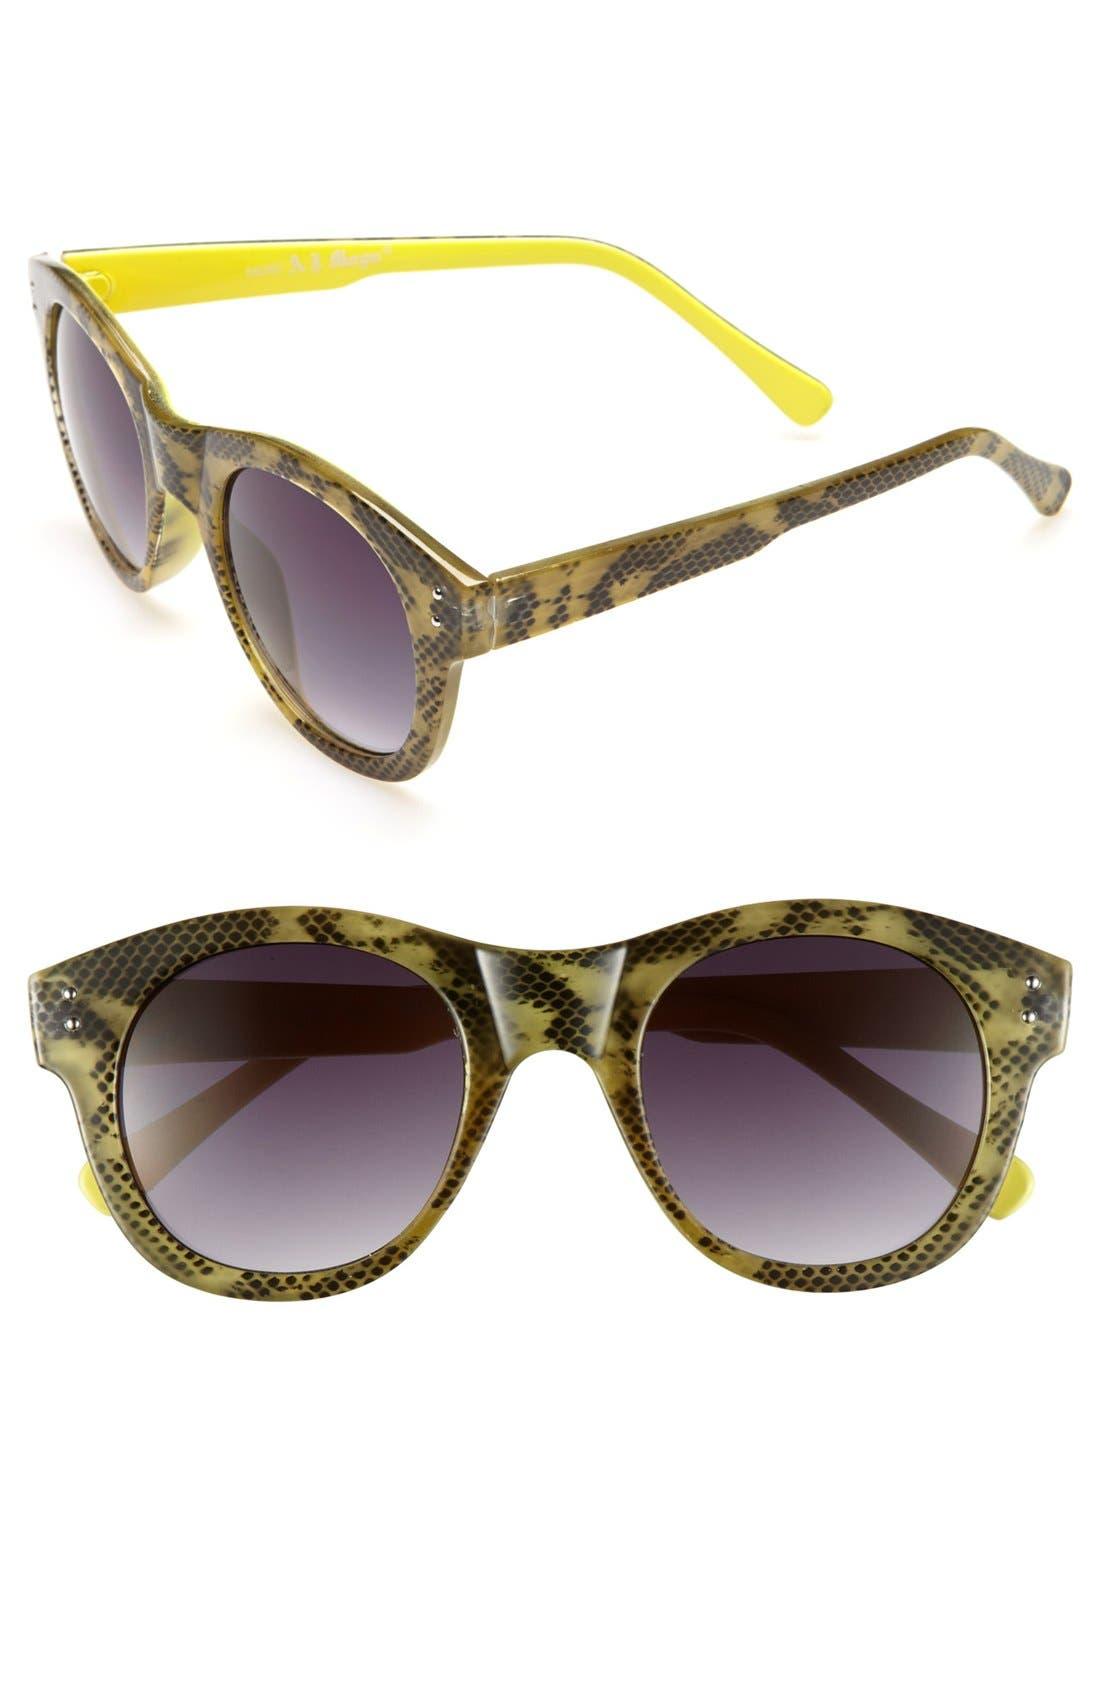 Alternate Image 1 Selected - A.J. Morgan 'Destiny' Sunglasses